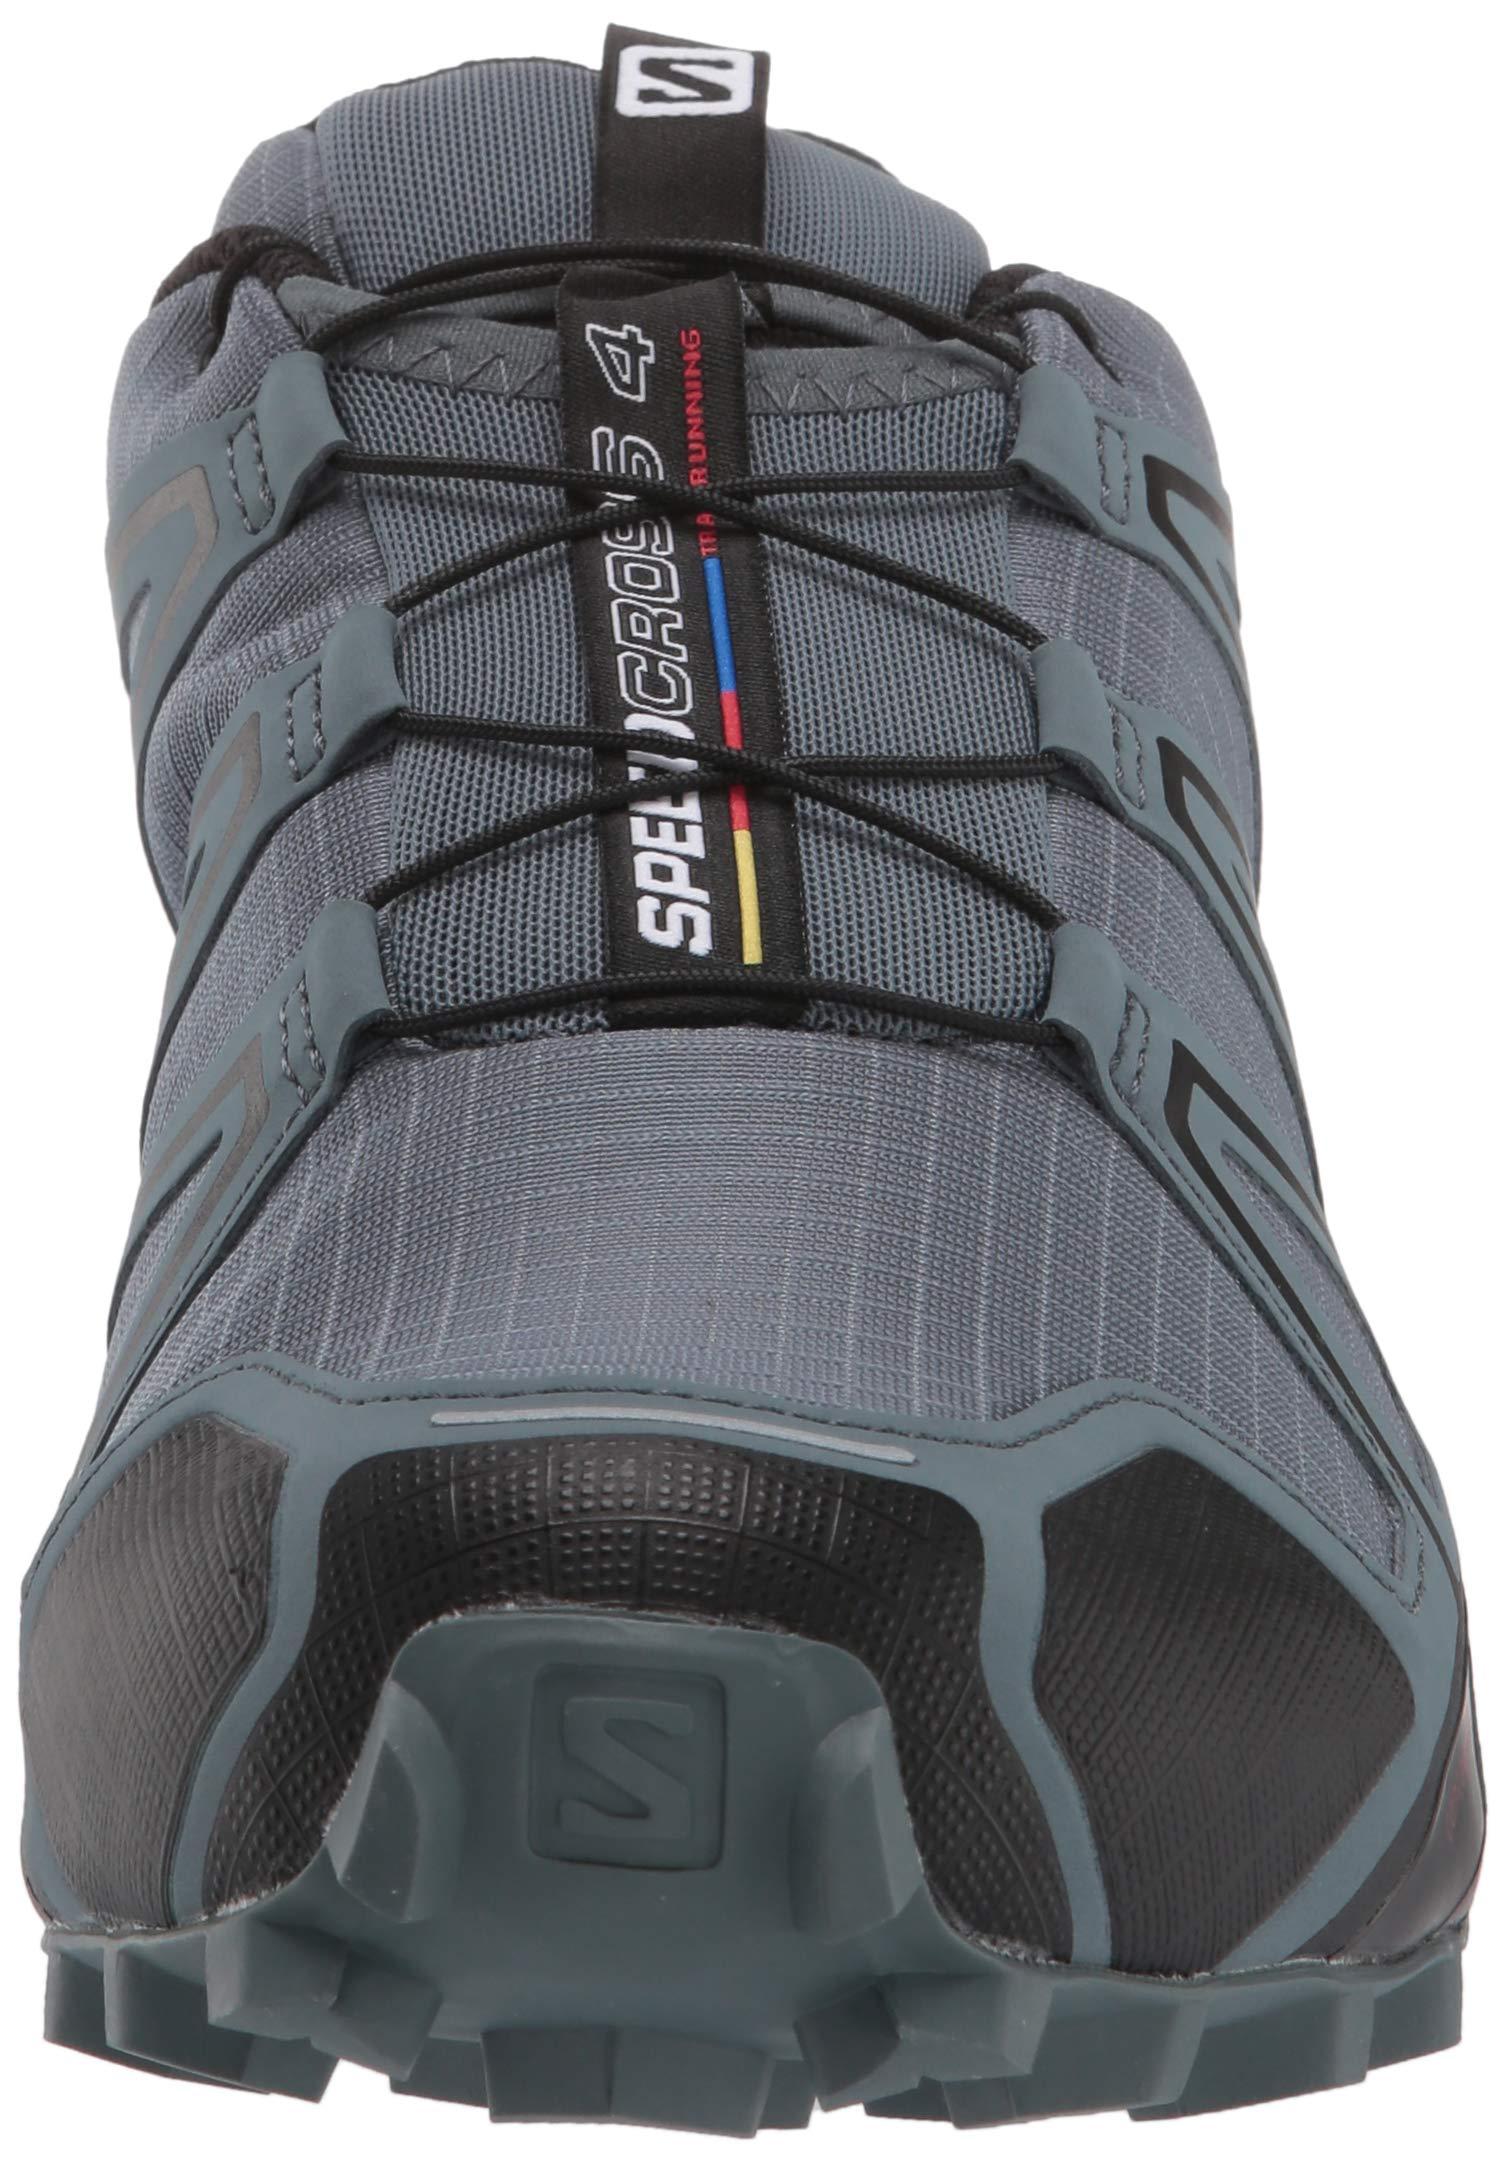 SALOMON Speedcross 4, Scarpe da Trail Running Uomo 9 spesavip